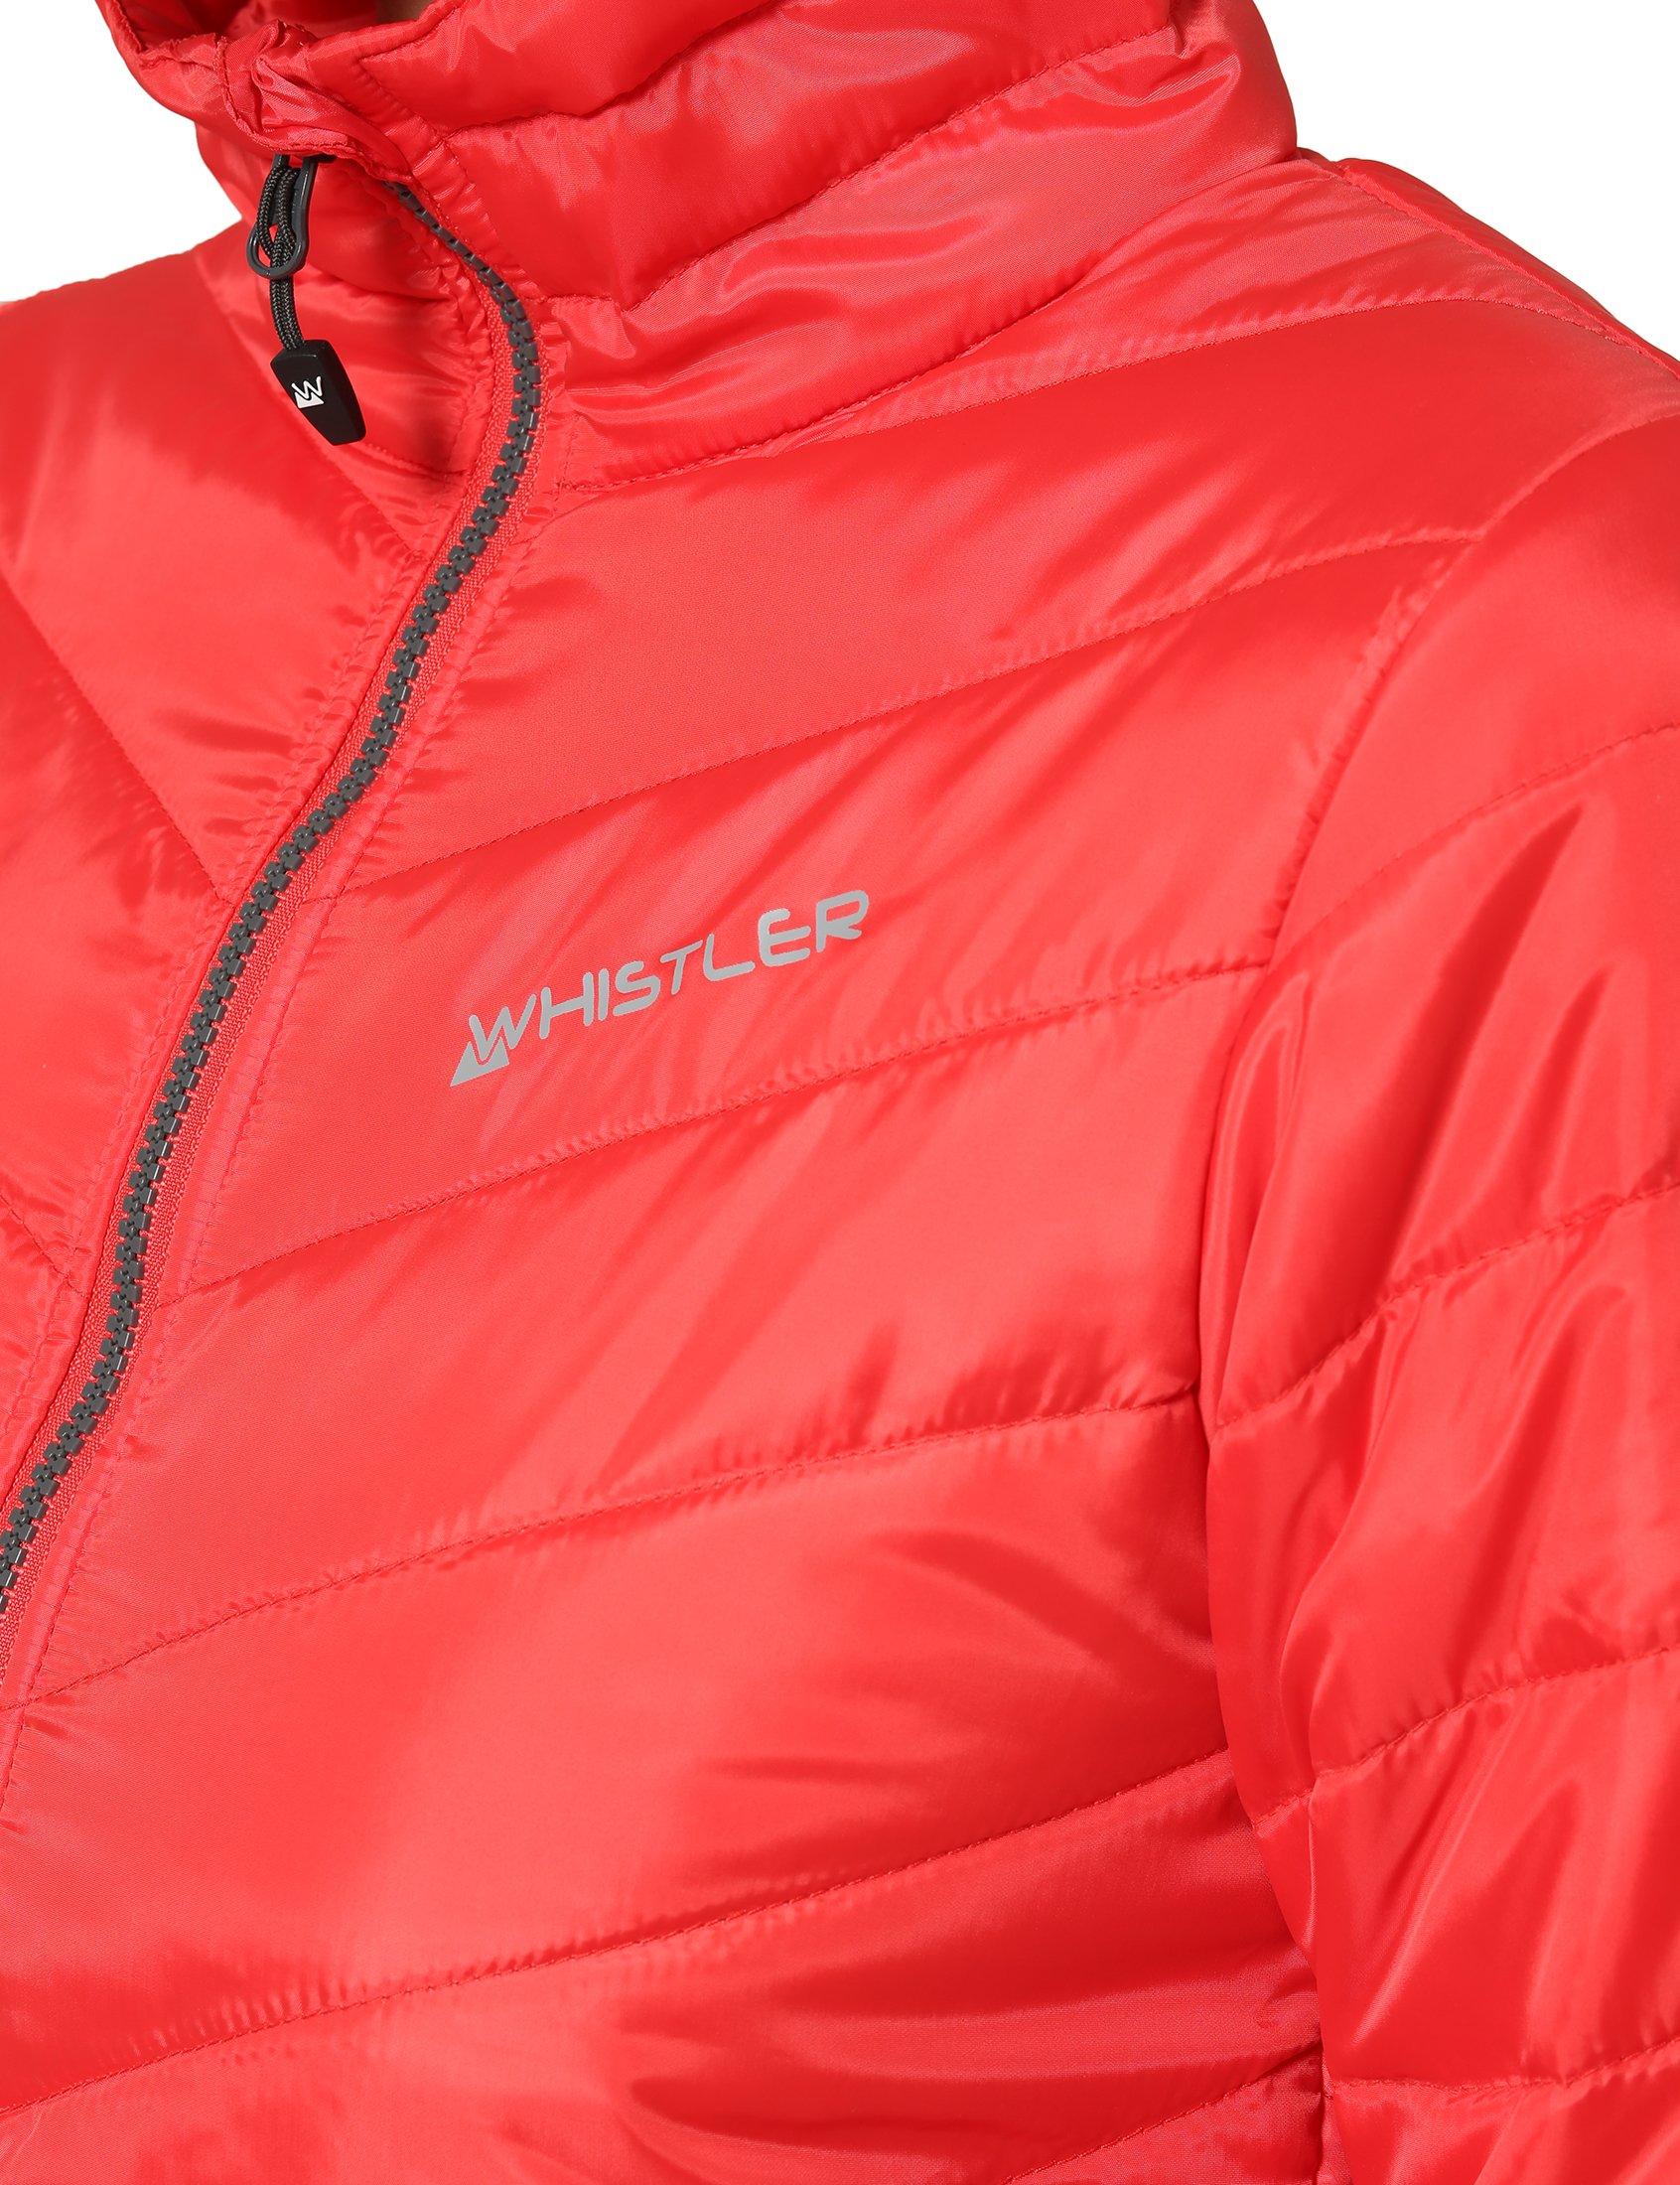 81SPqfDm4GL - Ultrasport Whistler Women's Quilted Jacket Foggia